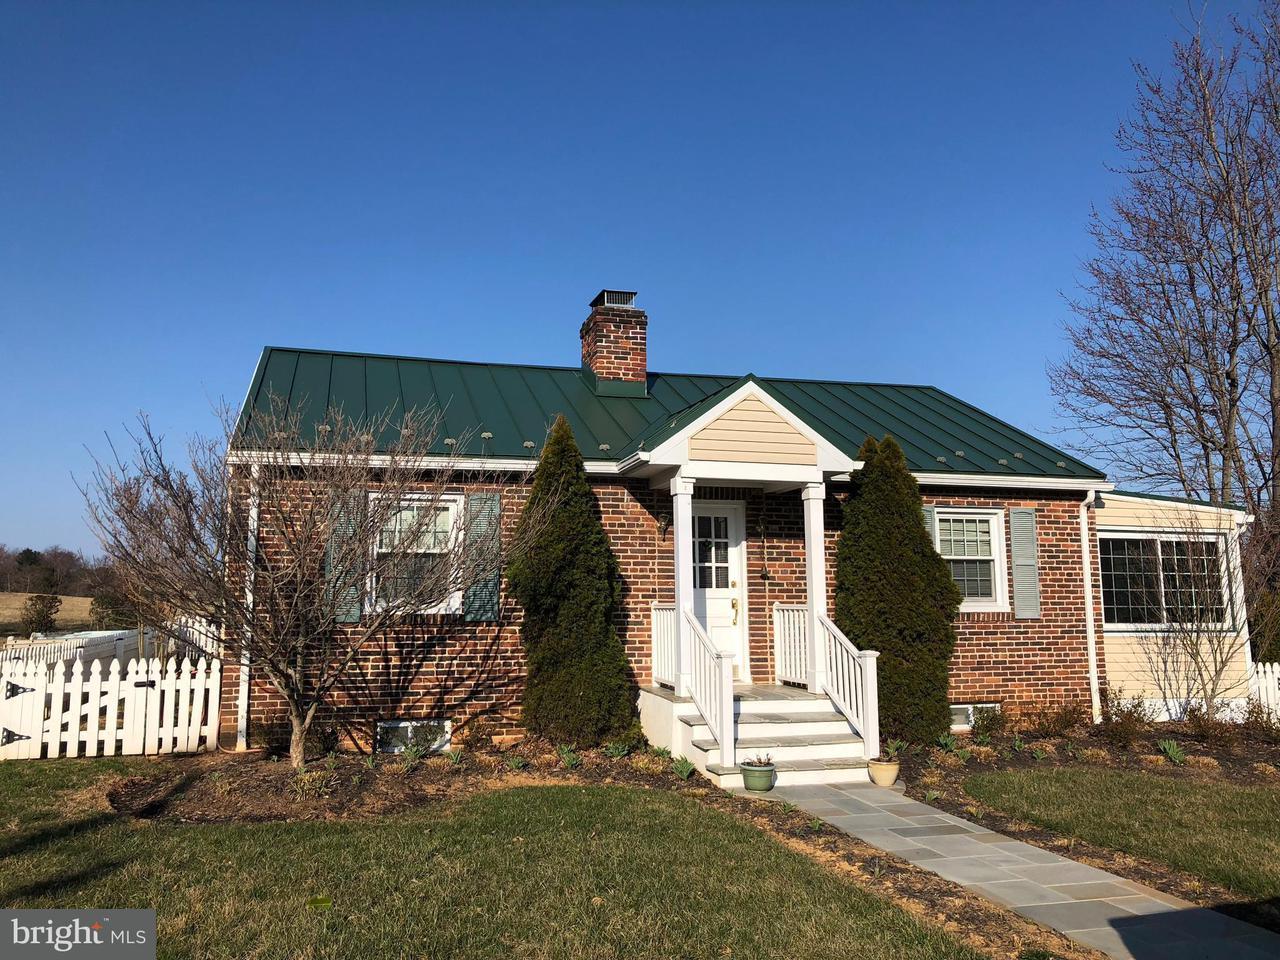 Vivienda unifamiliar por un Venta en 106 Madison St N 106 Madison St N Middleburg, Virginia 20117 Estados Unidos